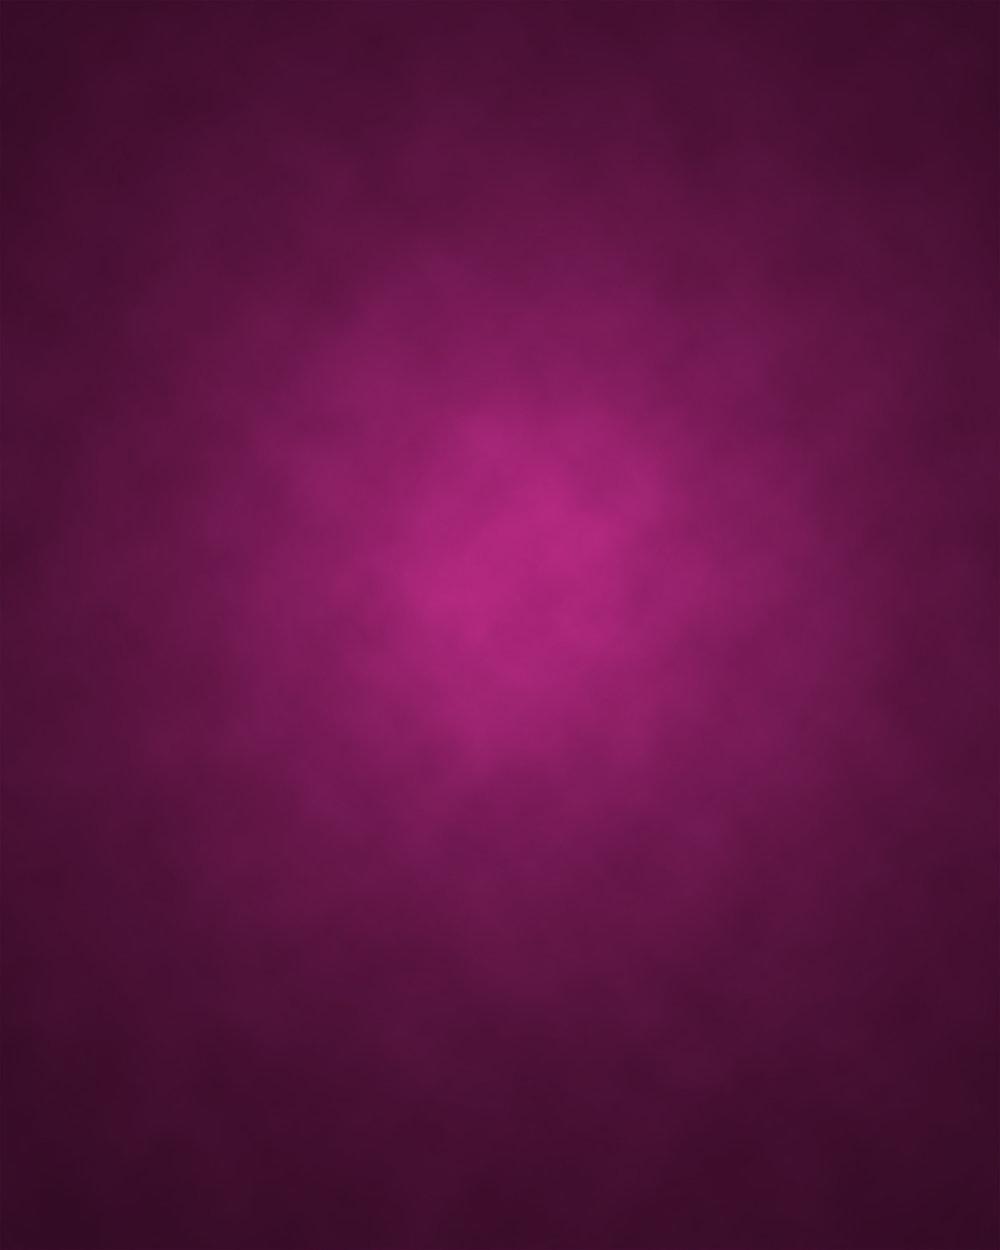 Background Option #10 - Magenta